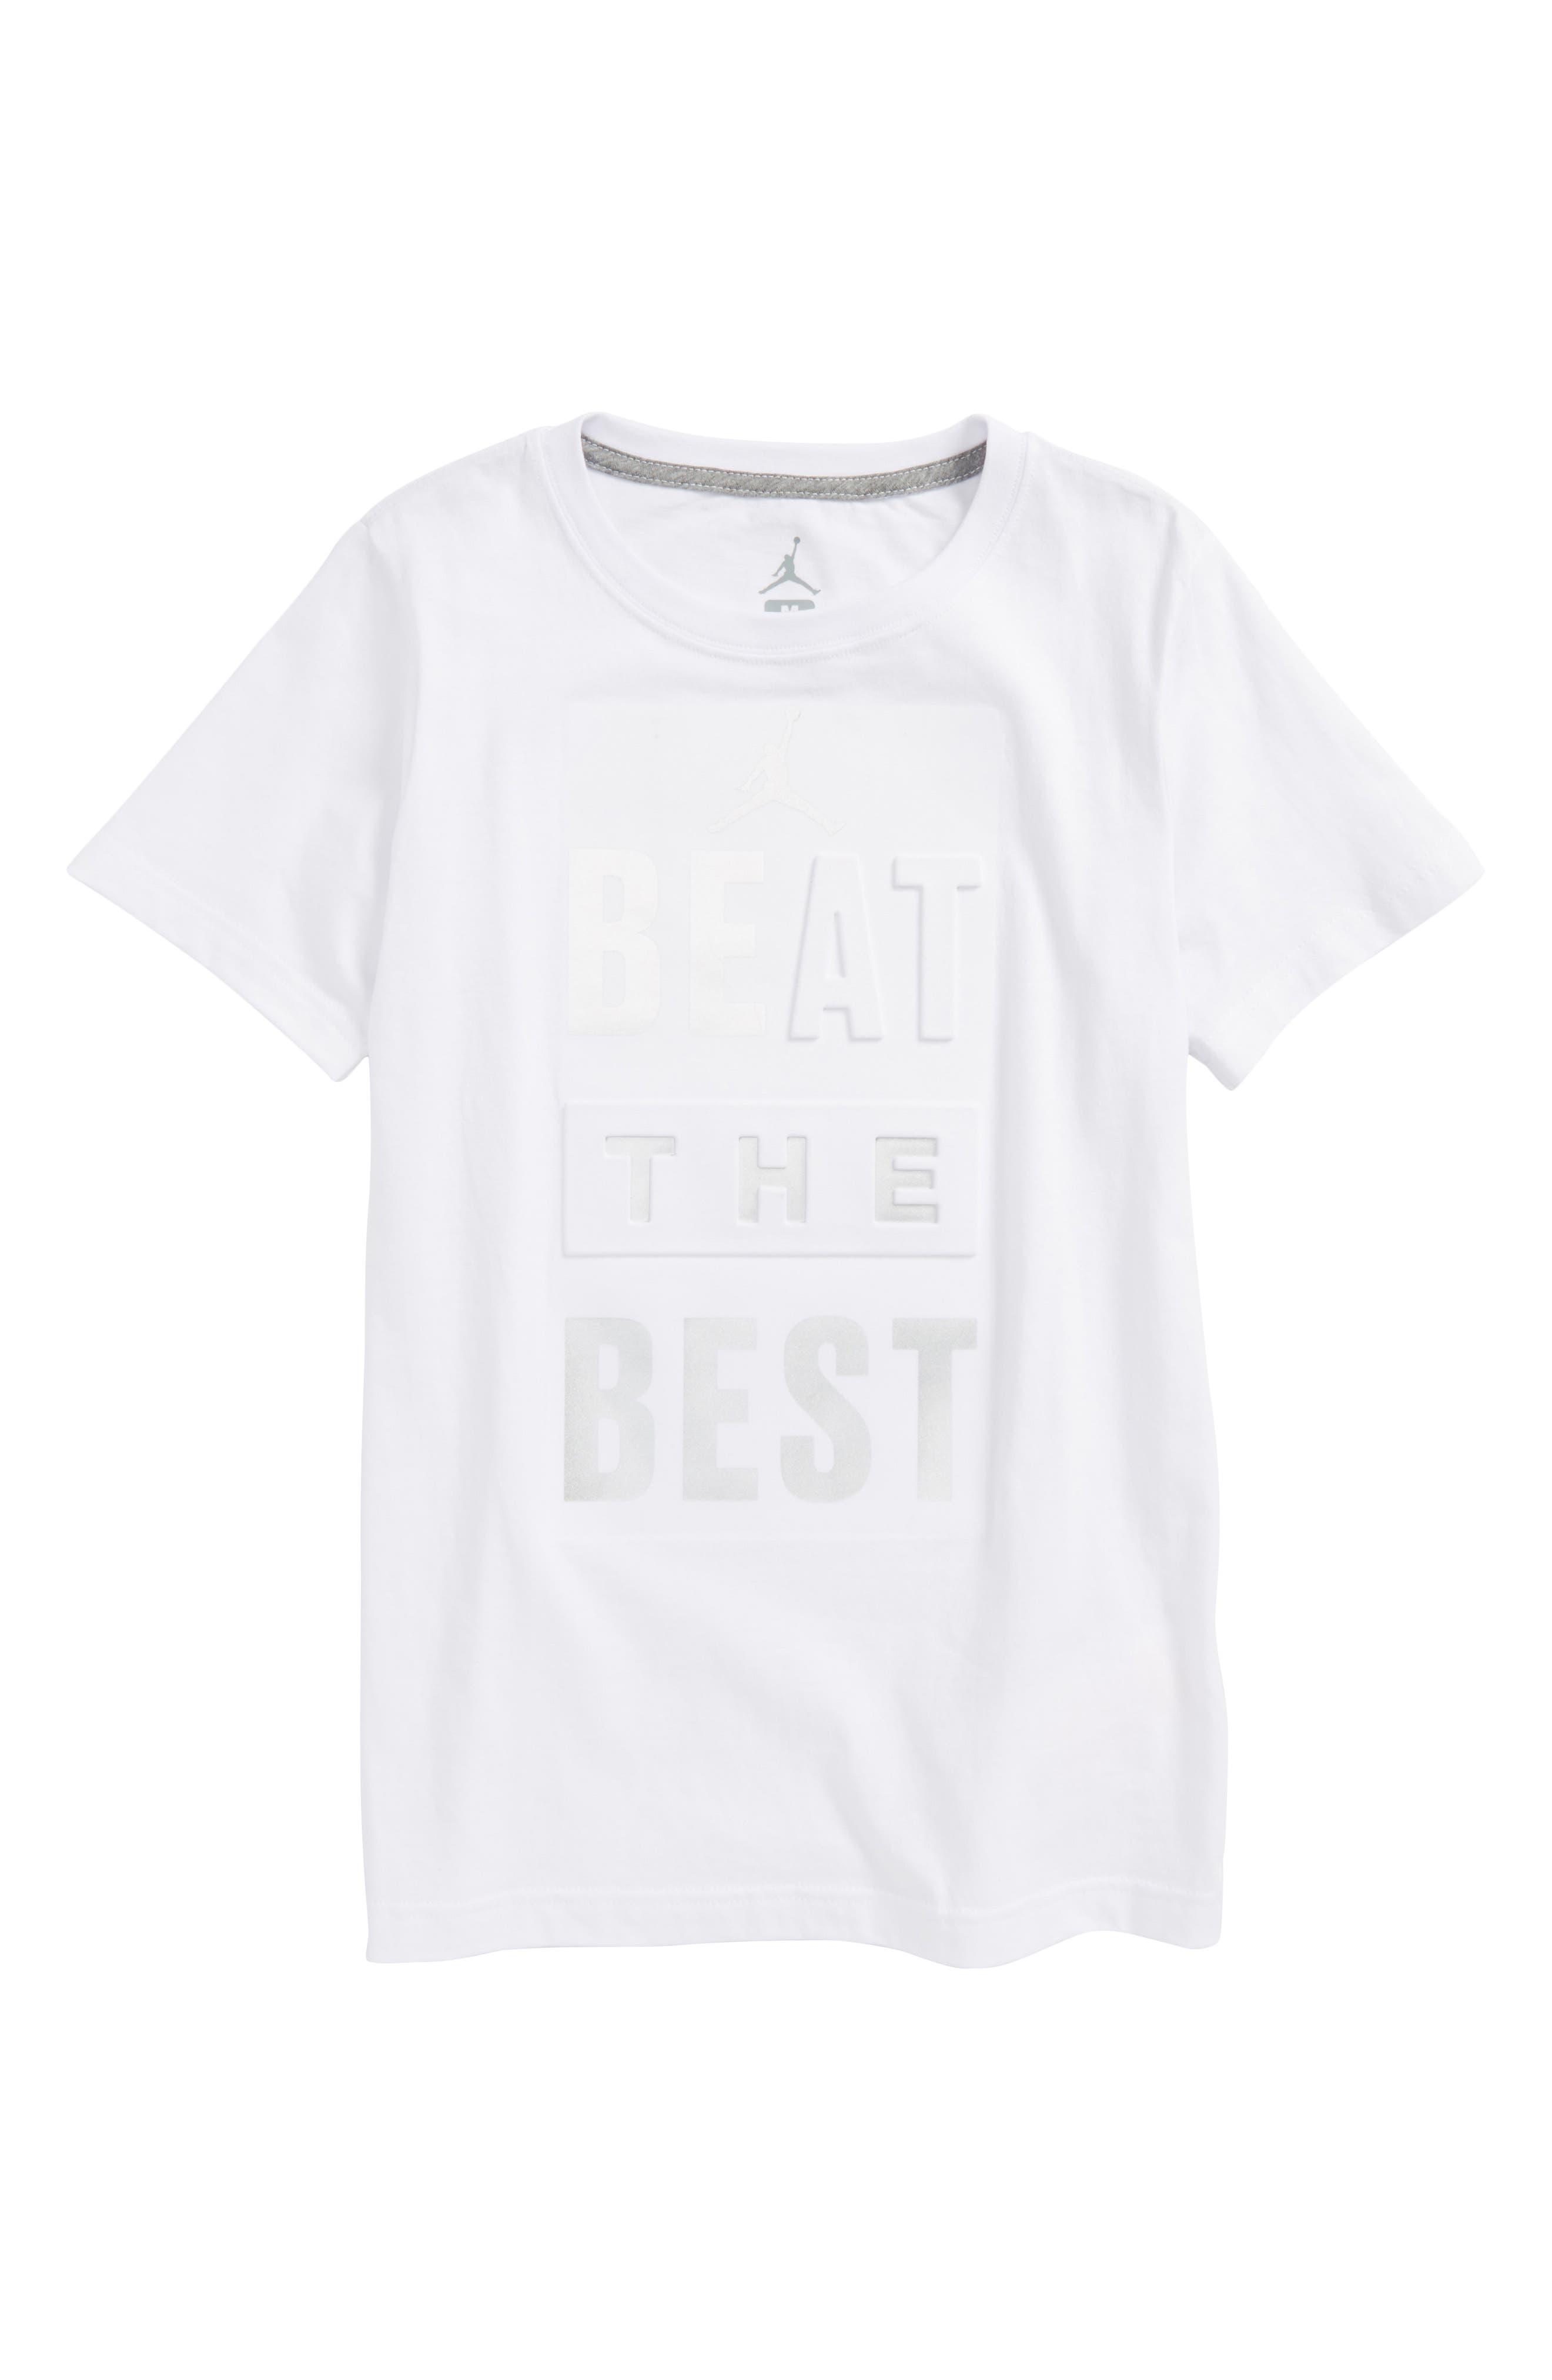 Jordan Beat the Best Graphic T-Shirt,                             Main thumbnail 1, color,